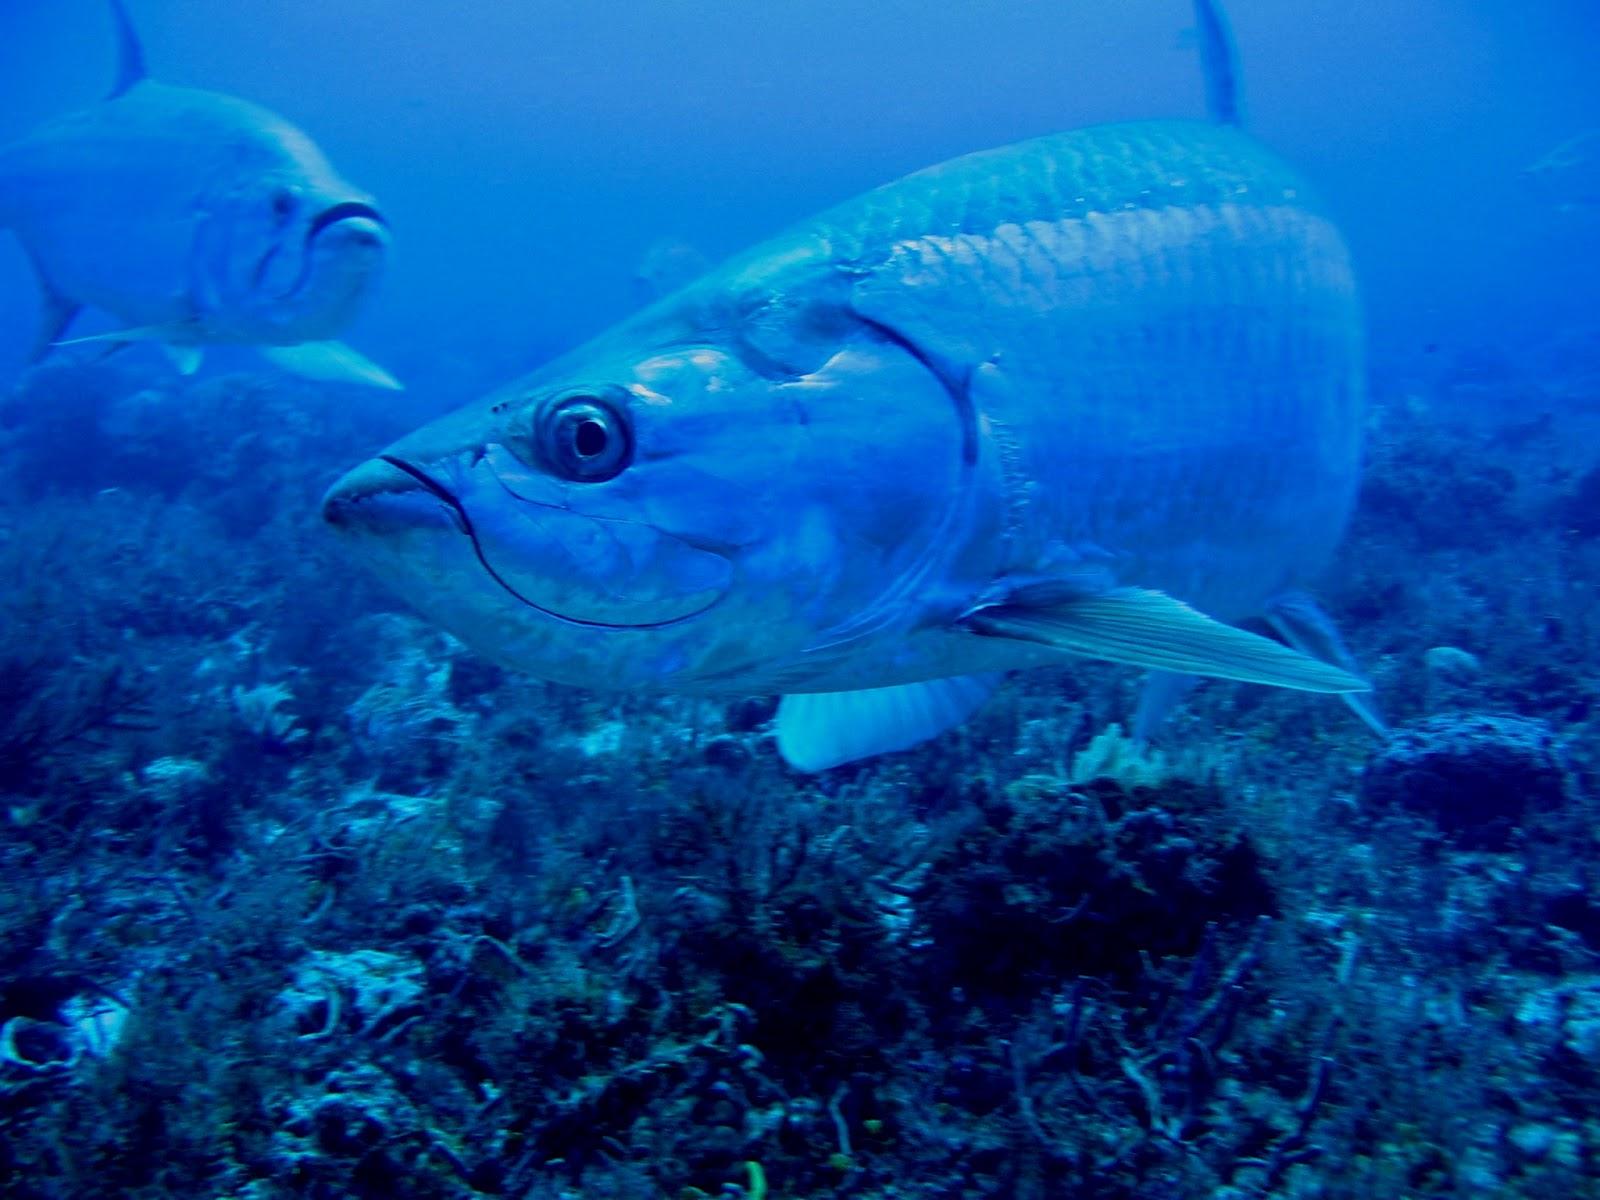 Вечернее фото рыб-единорогов фото